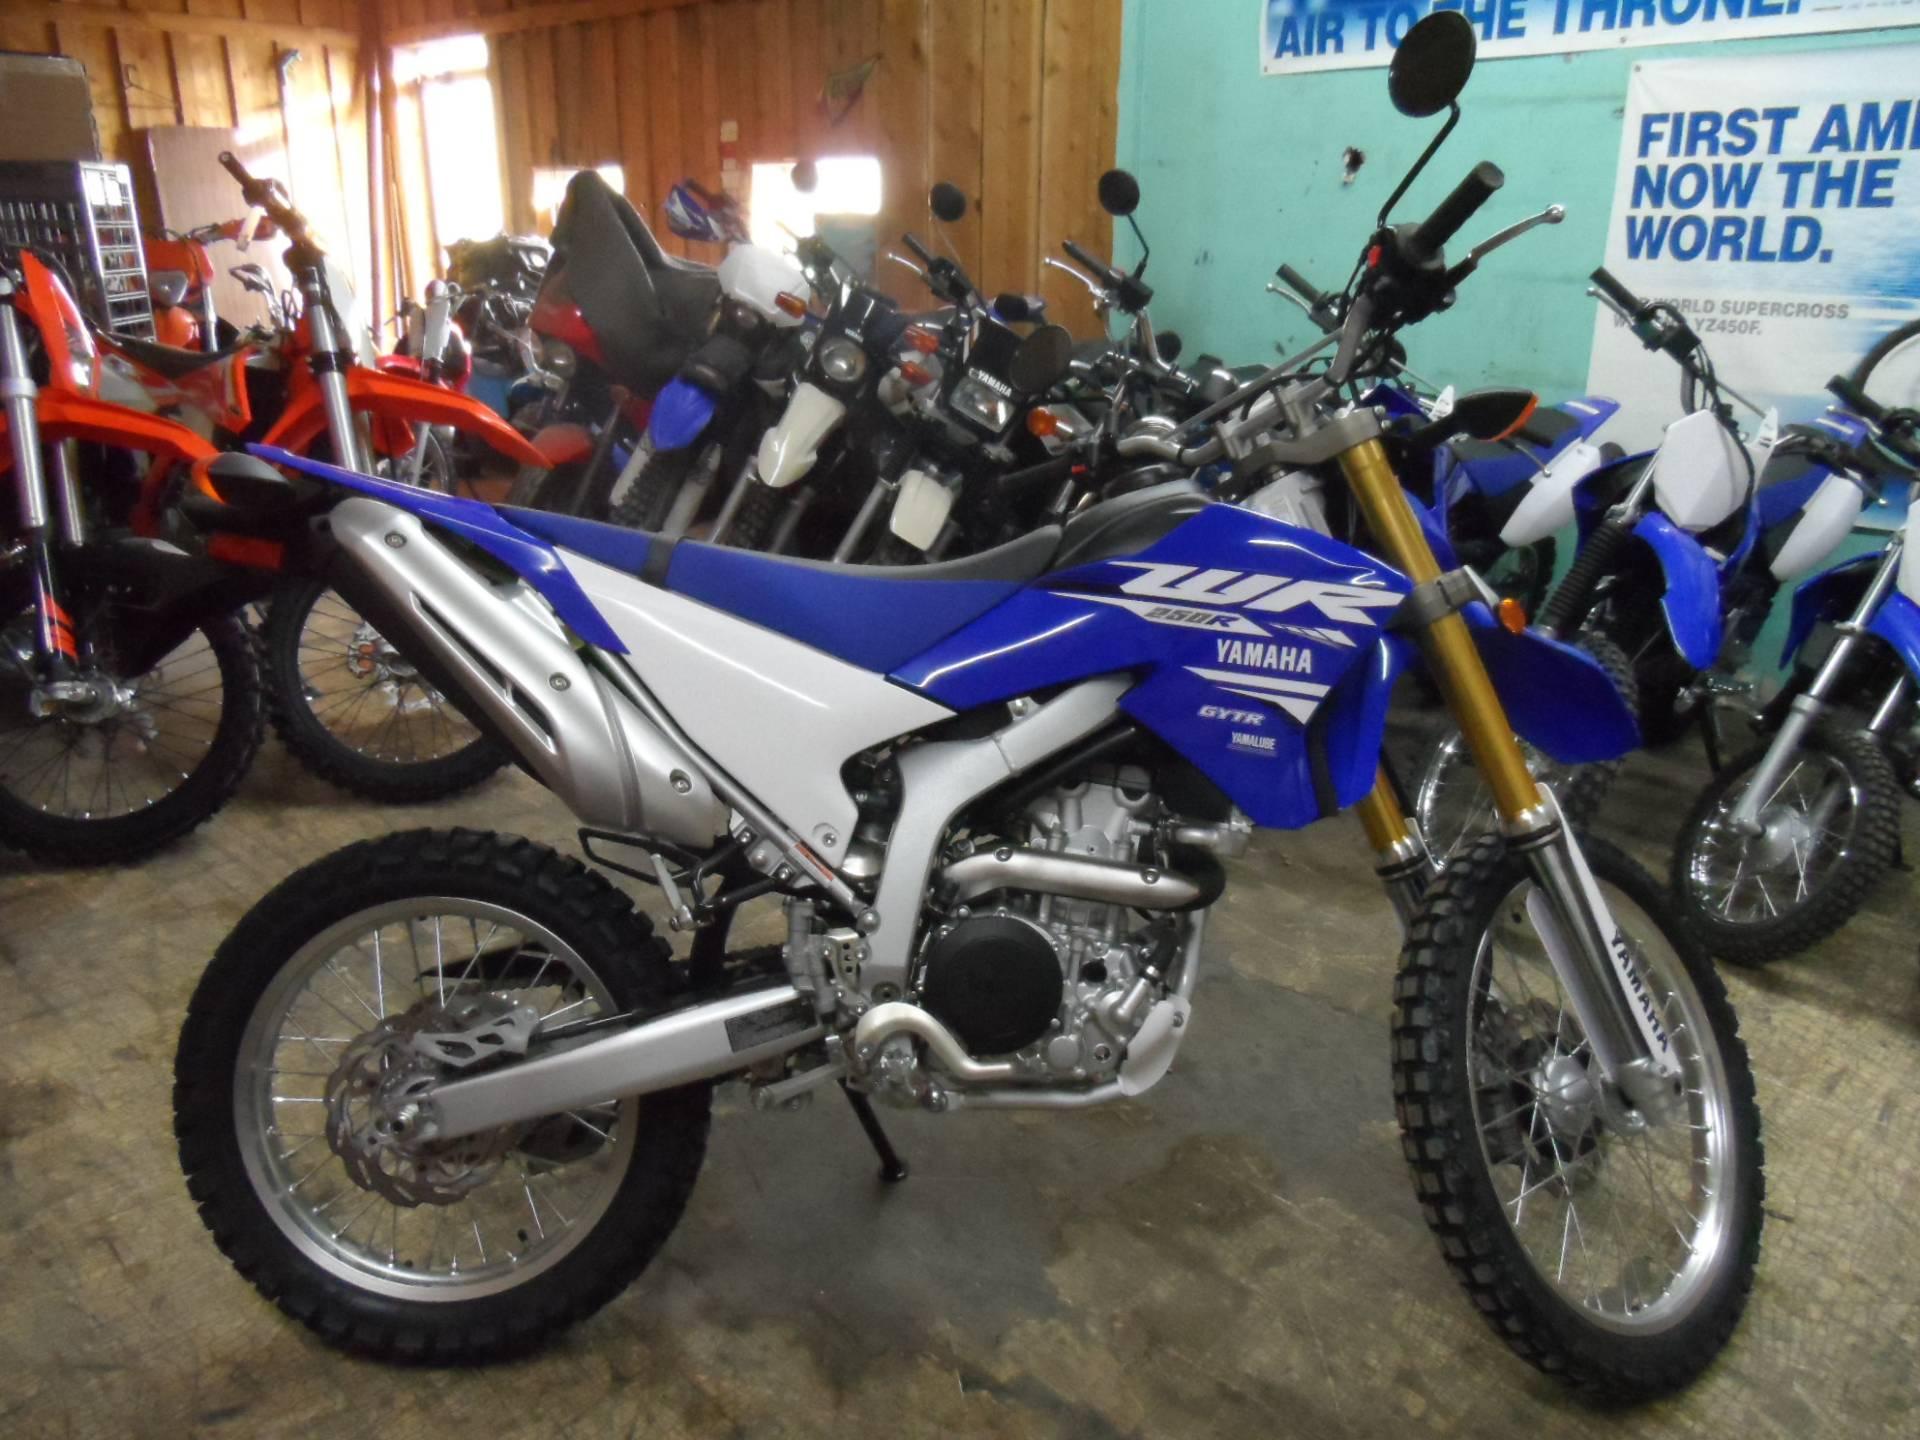 2018 yamaha wr250r motorcycles gunnison colorado for 2018 yamaha wr250r